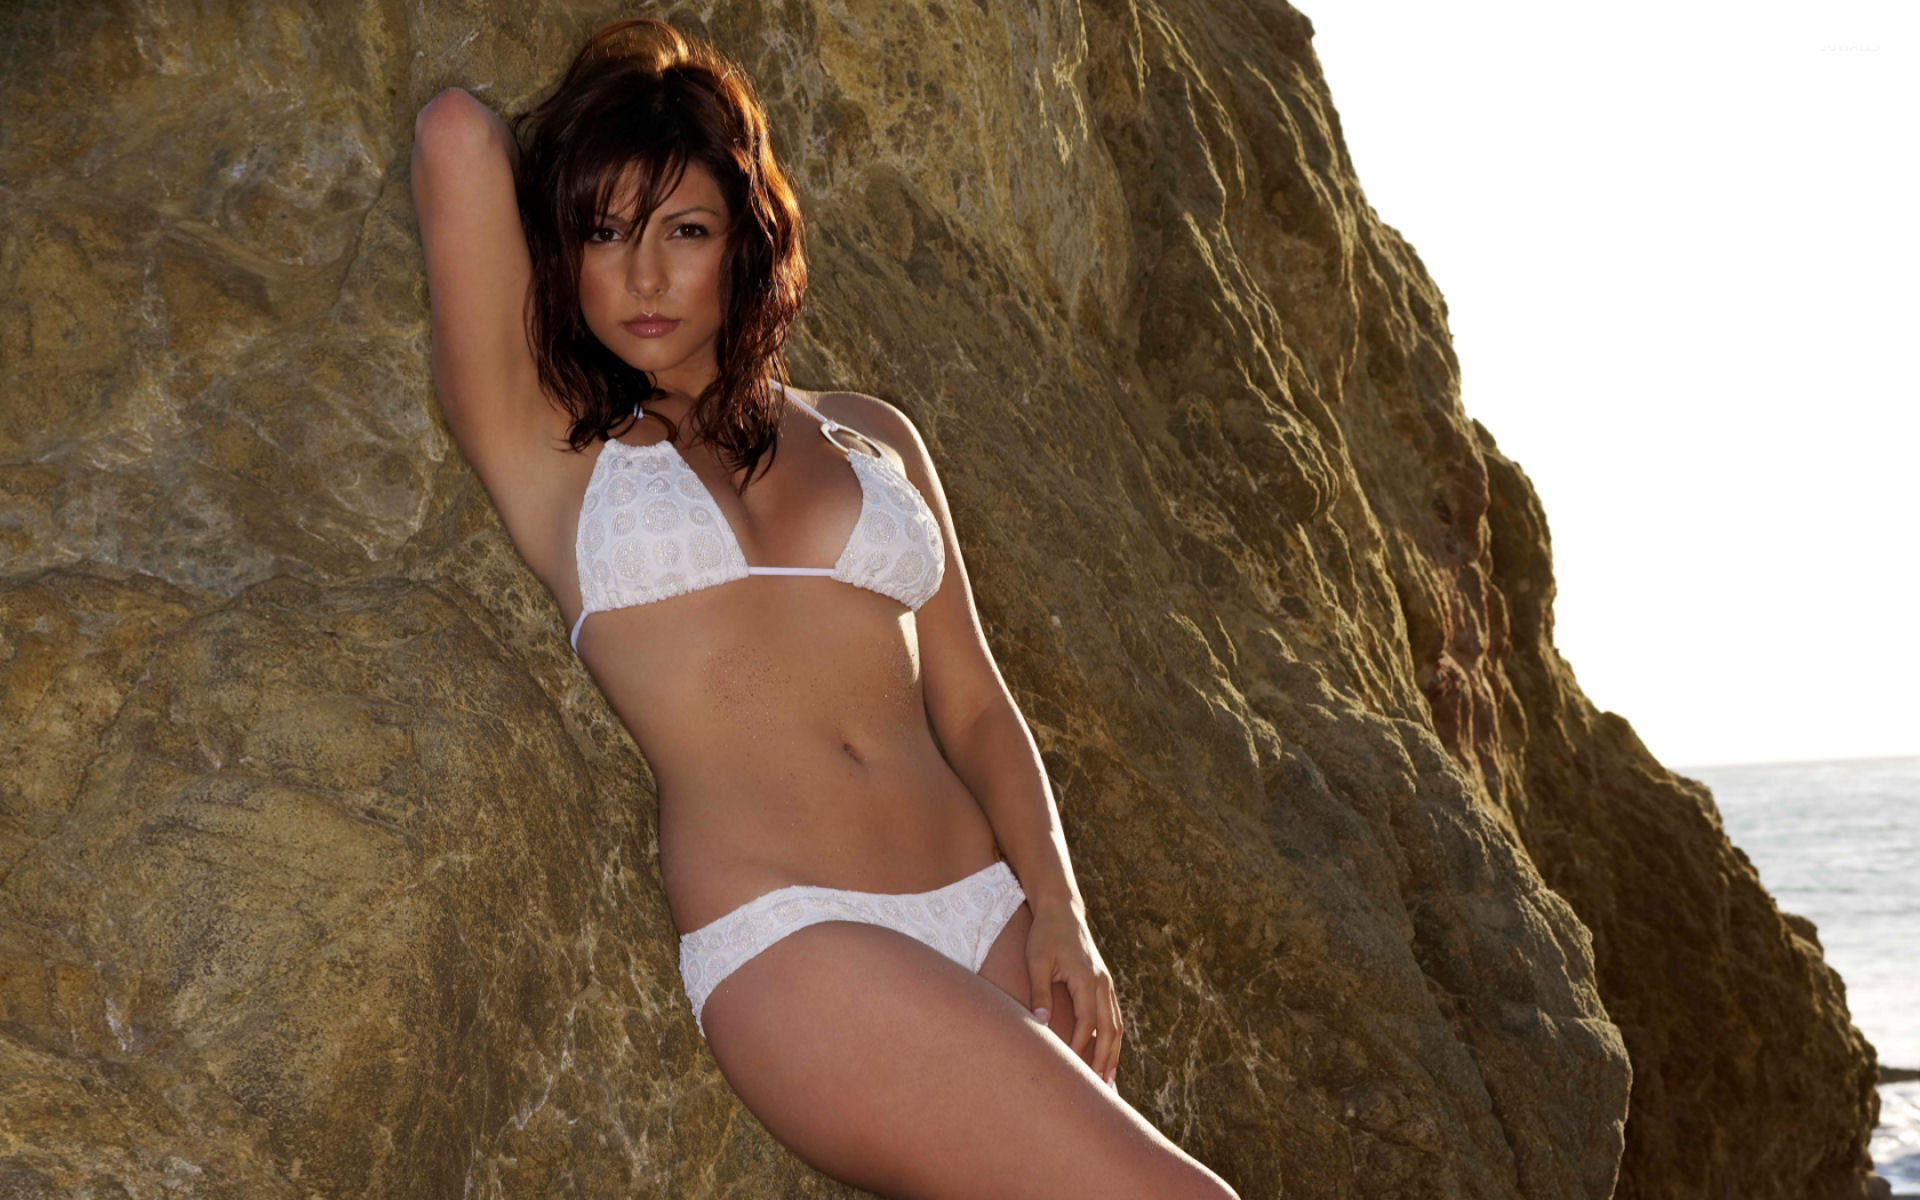 b573749de96 Roxanne Pallet with white swimsuit wallpaper - Celebrity wallpapers ...